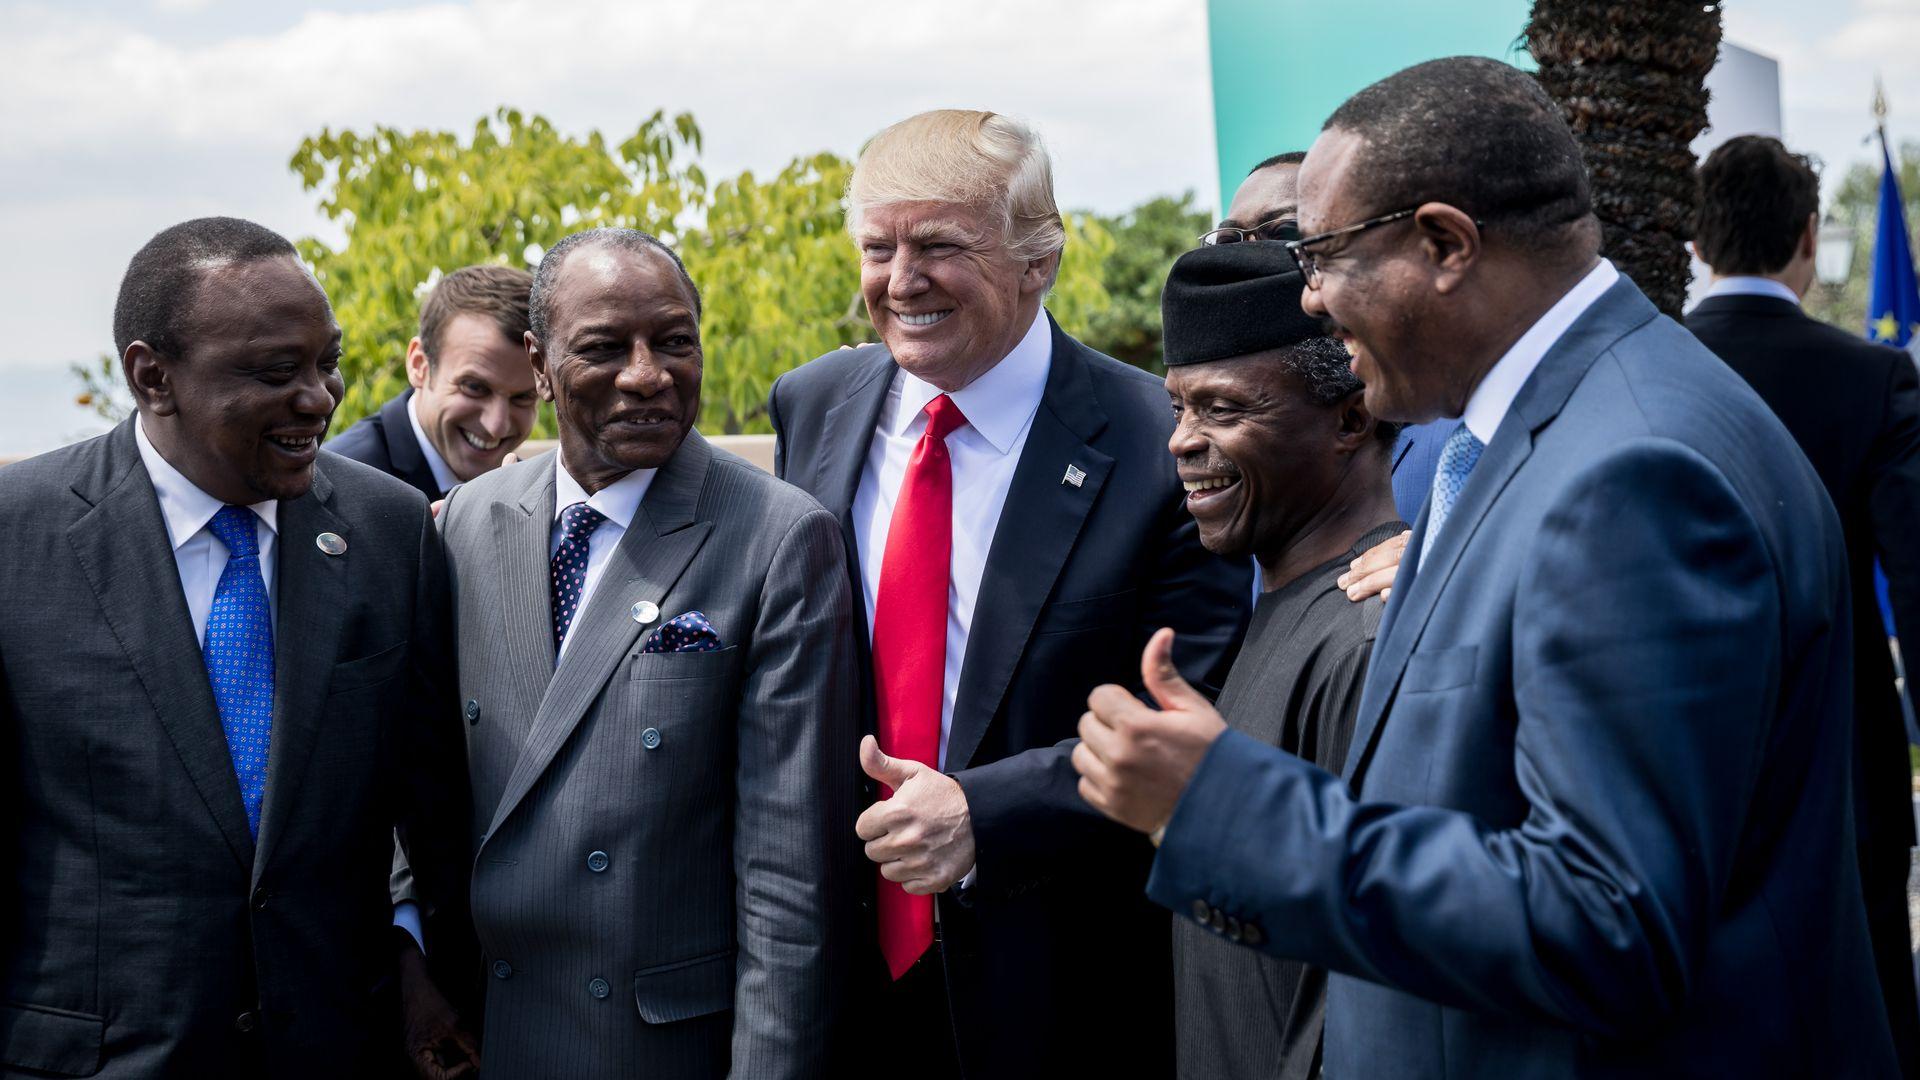 USPresident Donald Trump standing with Uhuru Kenyatt, Mahamadou Issoufou, Muhammadu Buhari and President of the African Development Bank.